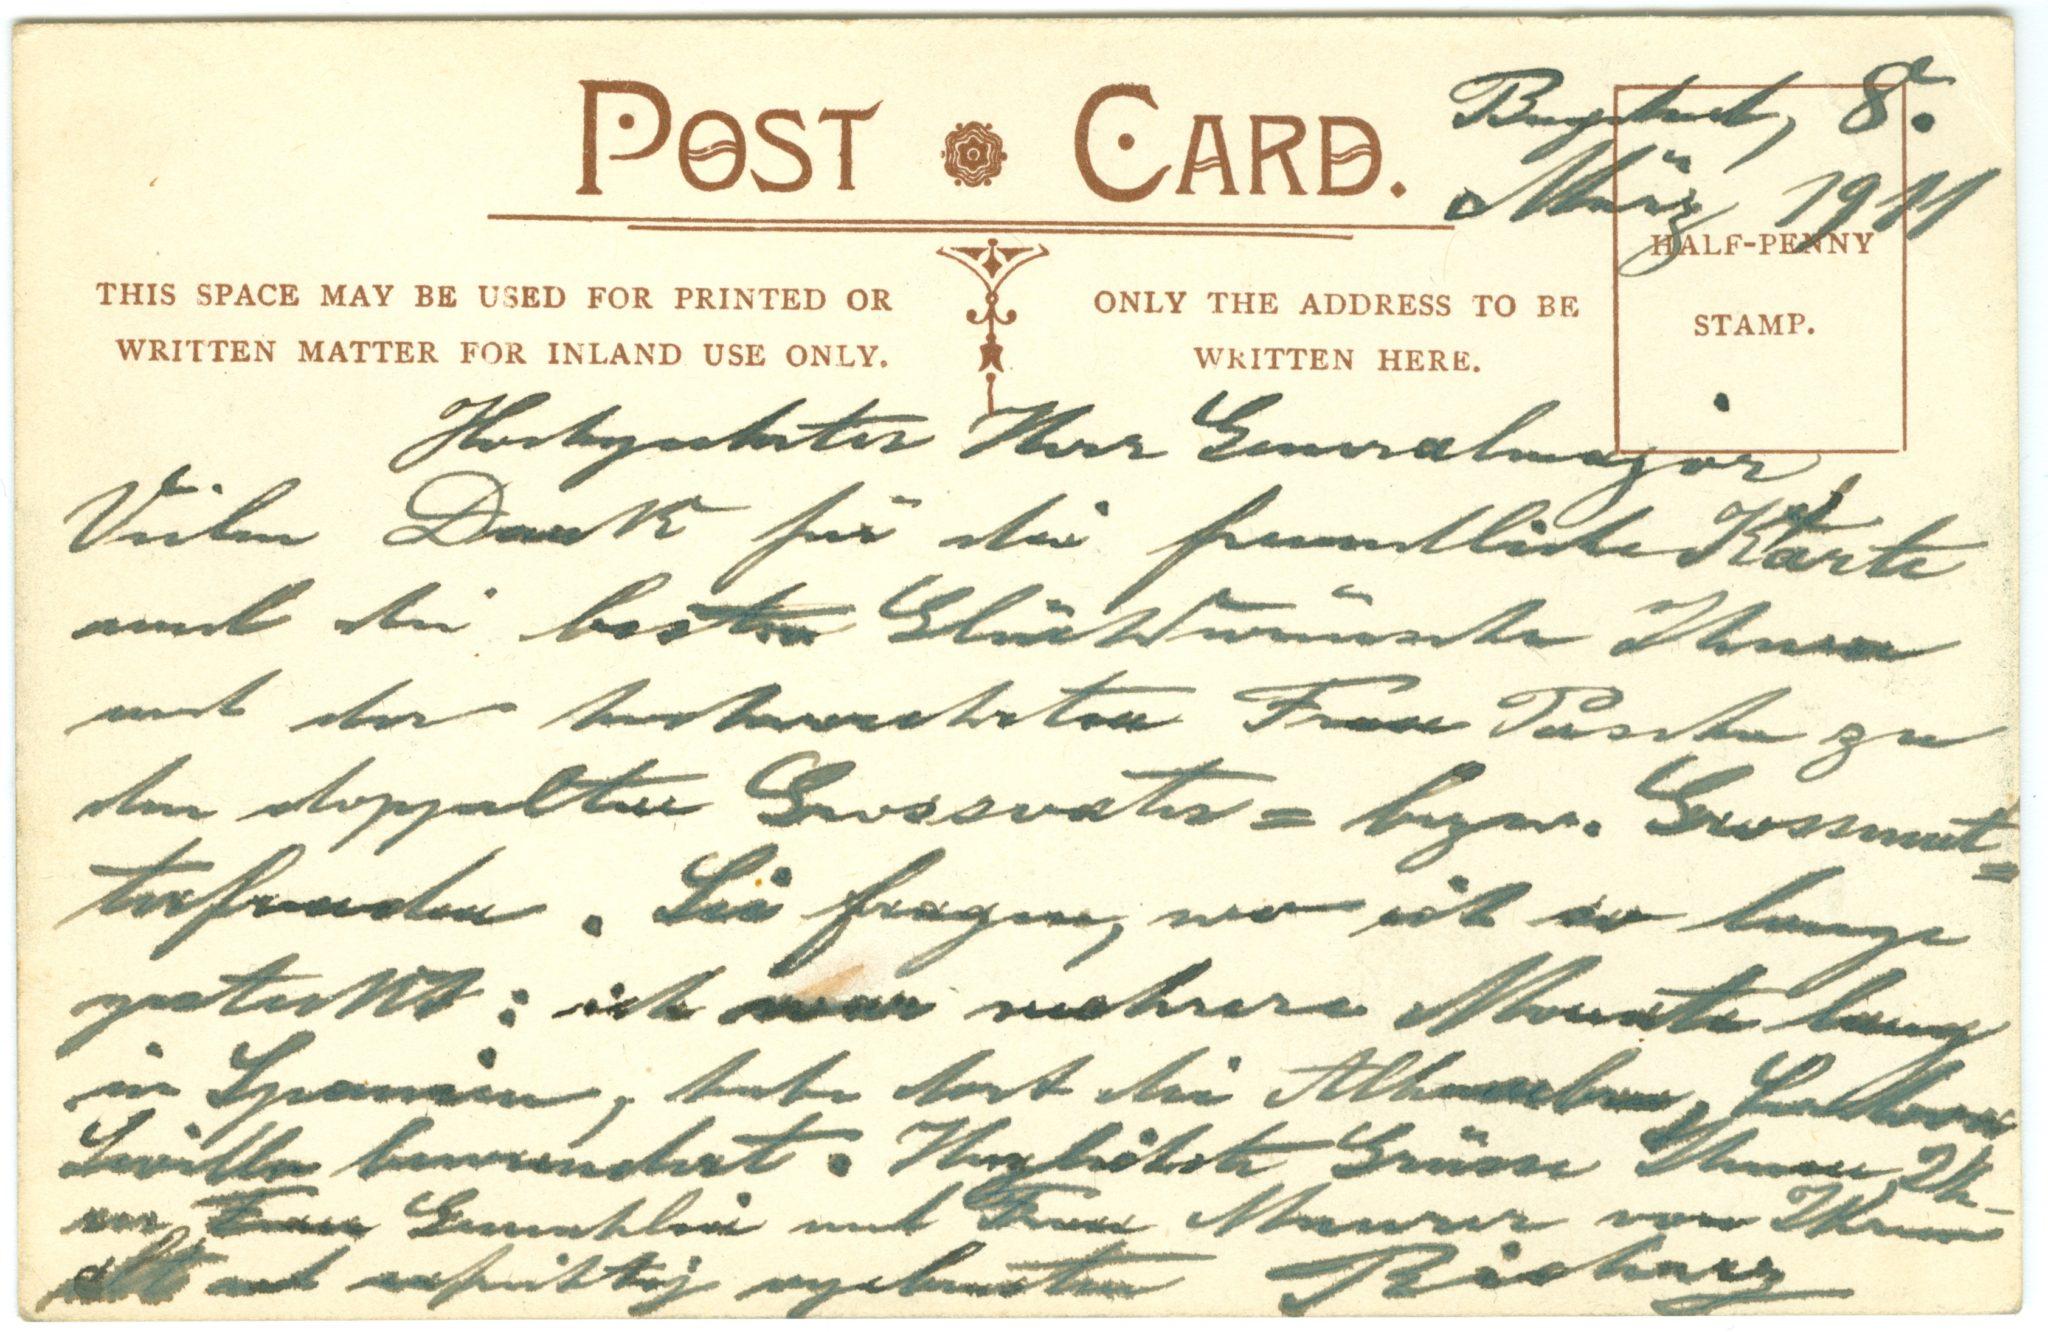 Rückseite der Postkarte